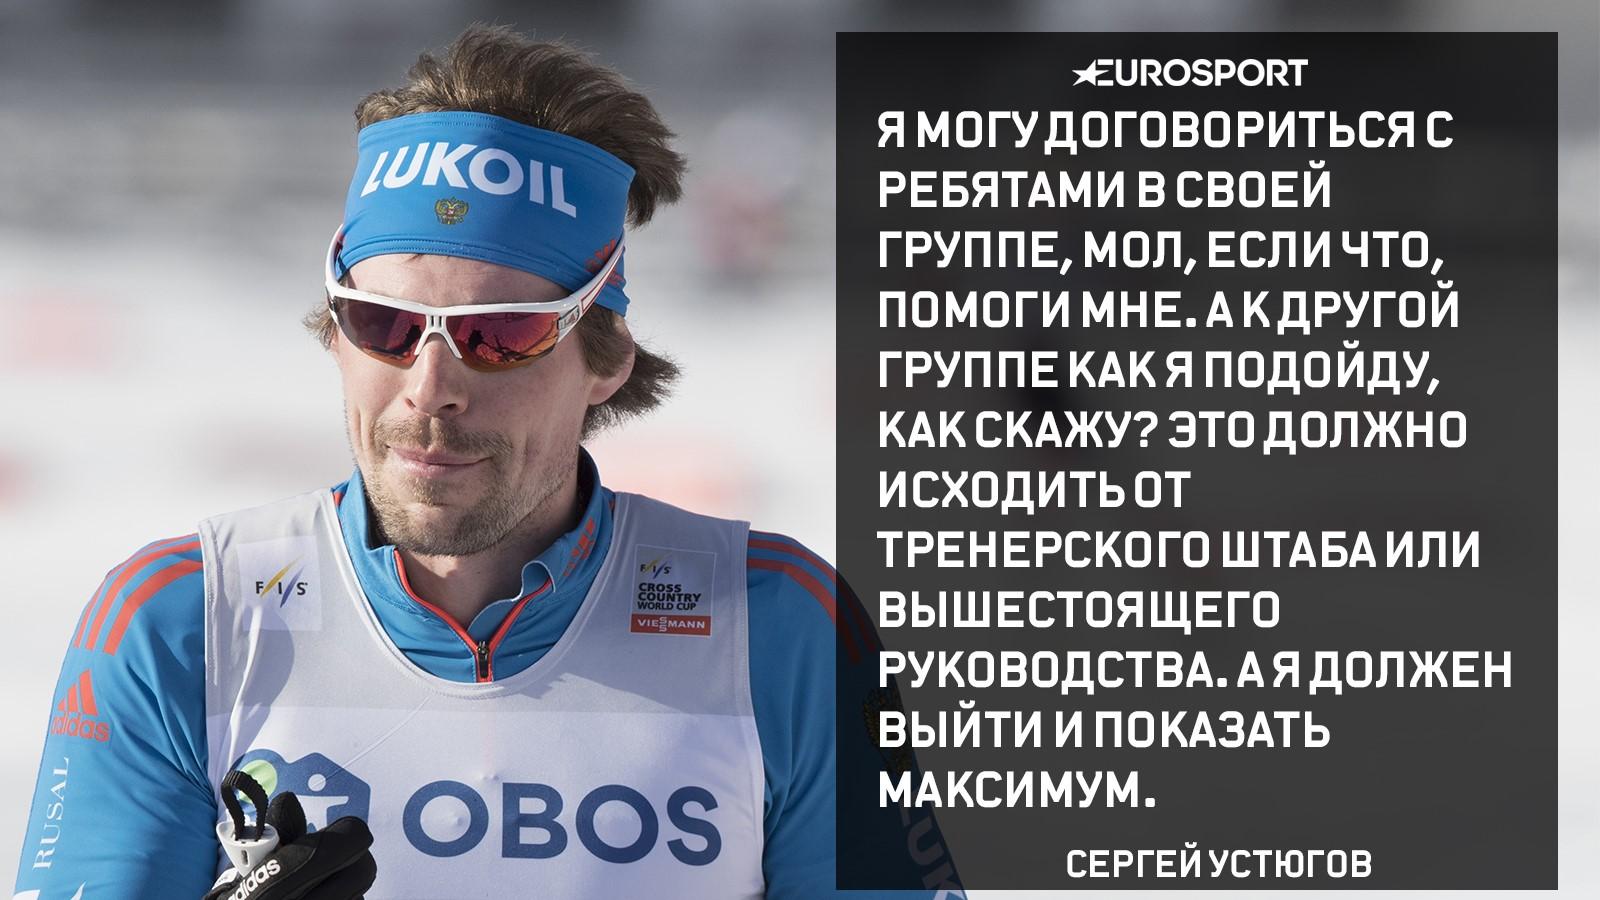 https://i.eurosport.com/2019/11/05/2710580.jpg